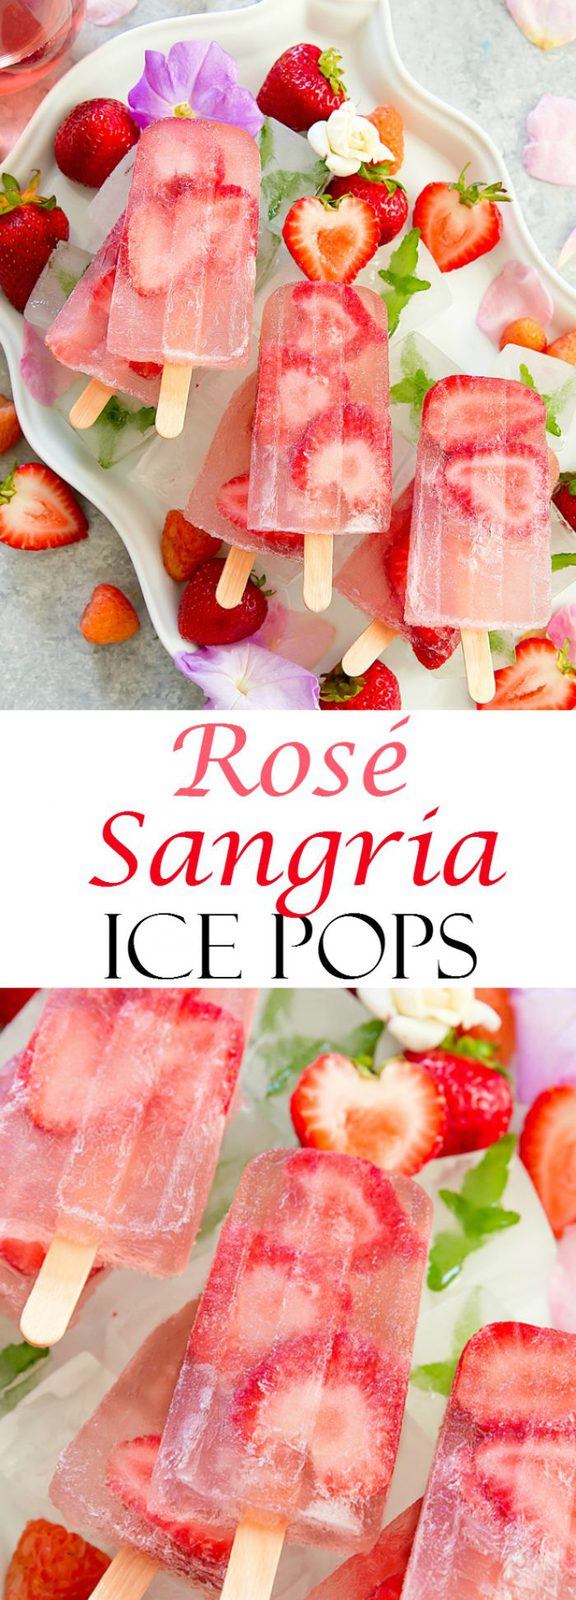 Rosé Sangria Summer Ice Pops